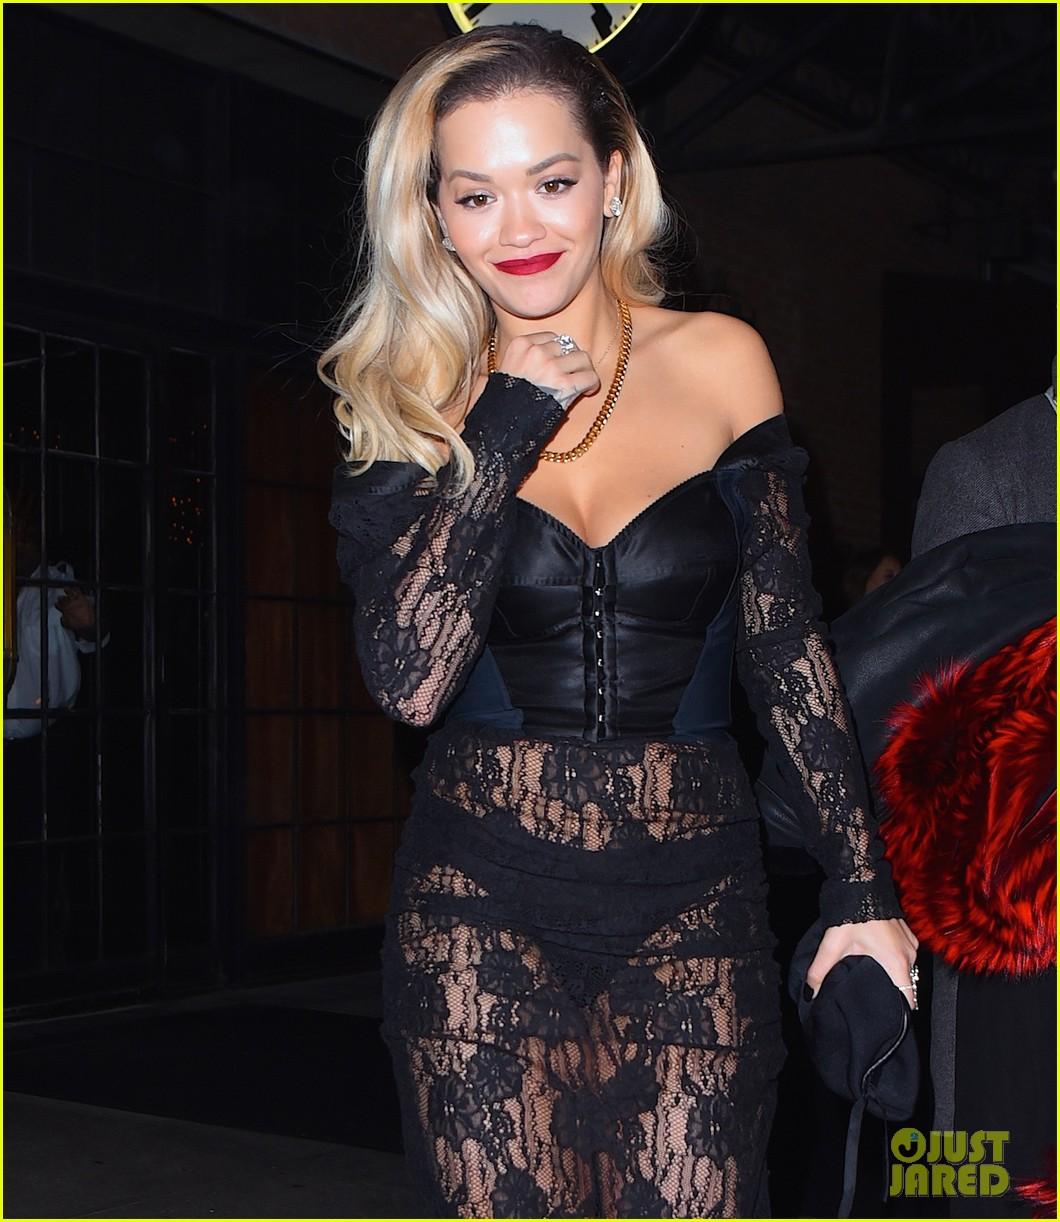 Watch Rita Ora Is Calvin Harris' Bond Girl' In Sexy Beach Snap video